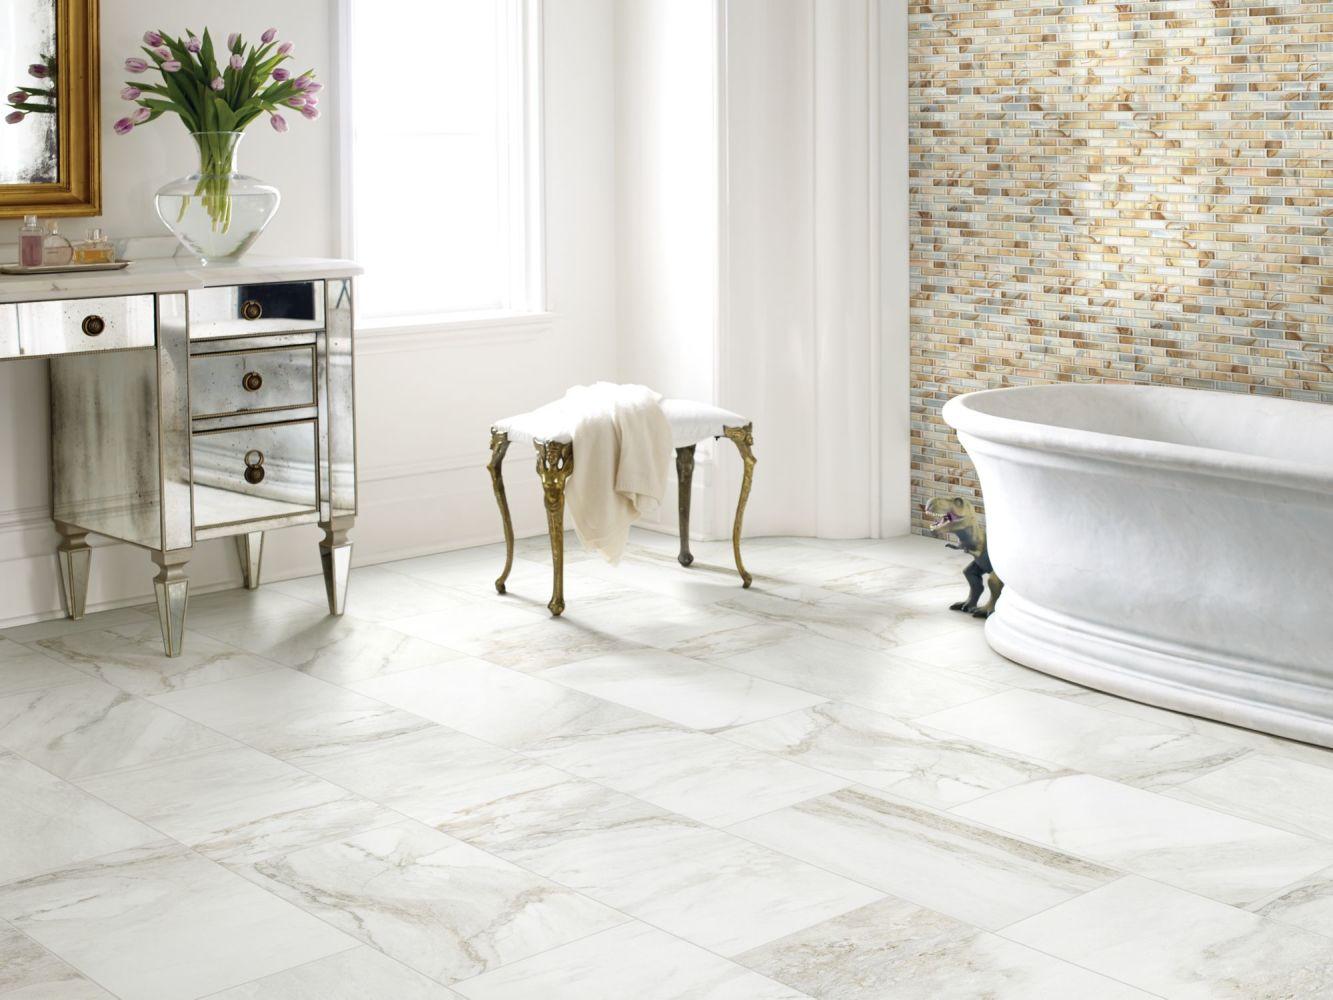 Shaw Floors Home Fn Gold Ceramic Capitol 13×13 Sanctuary 00100_TGN72